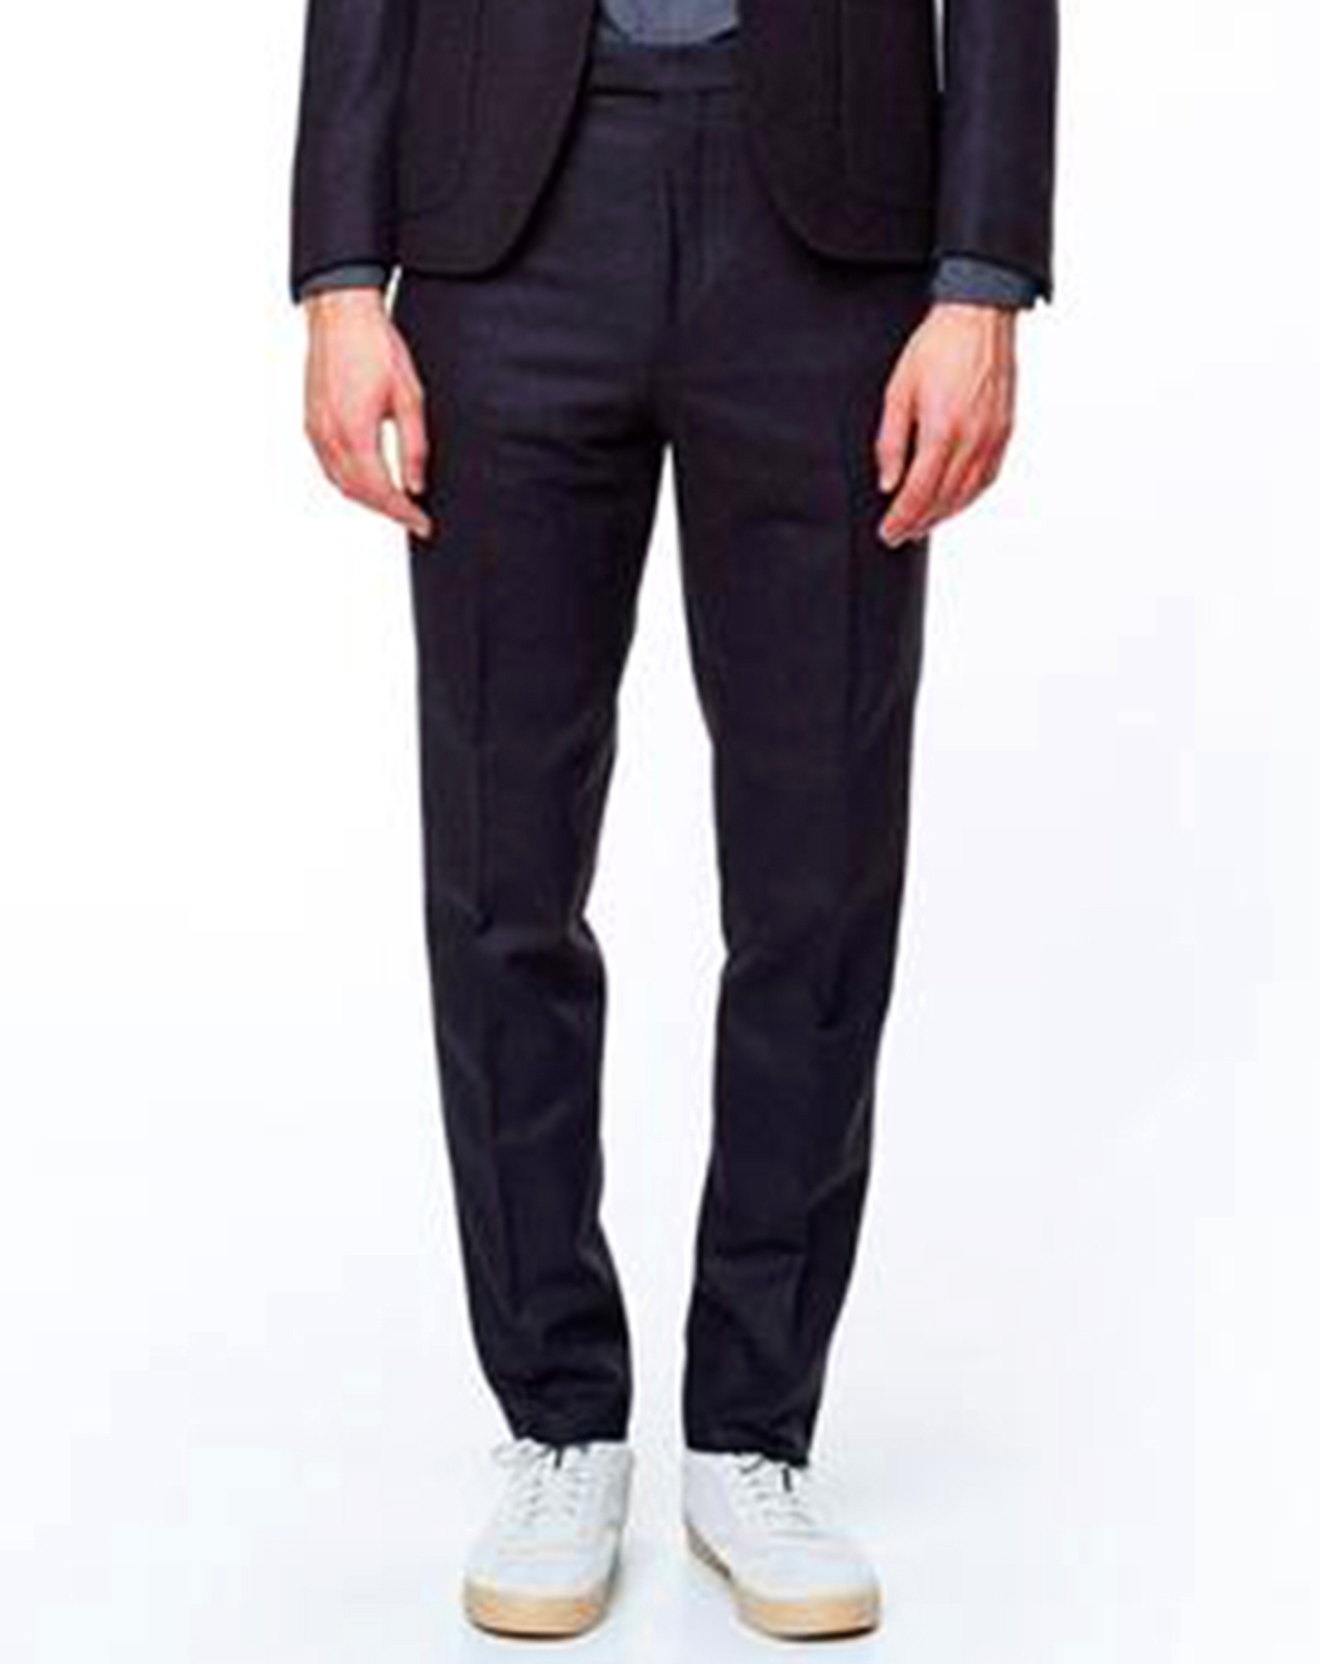 Pantalon 100% Laine Vierge Todd marine - Bellerose - Modalova